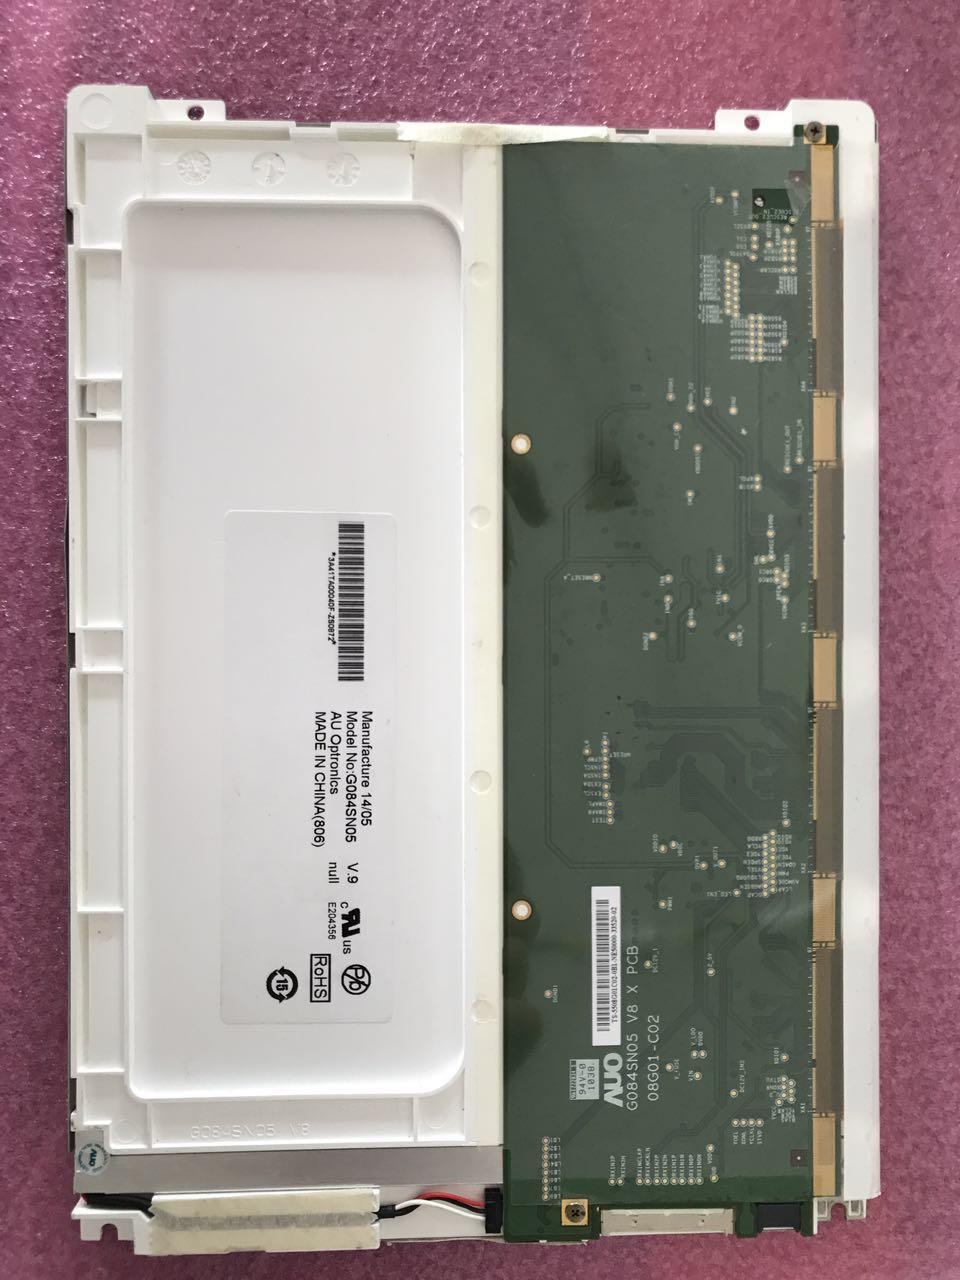 100% original AUO 8,4 zoll G084SN05 V.9 G84SN05 V.8 Breite temperatur LED industrielle bedienfeld AUO